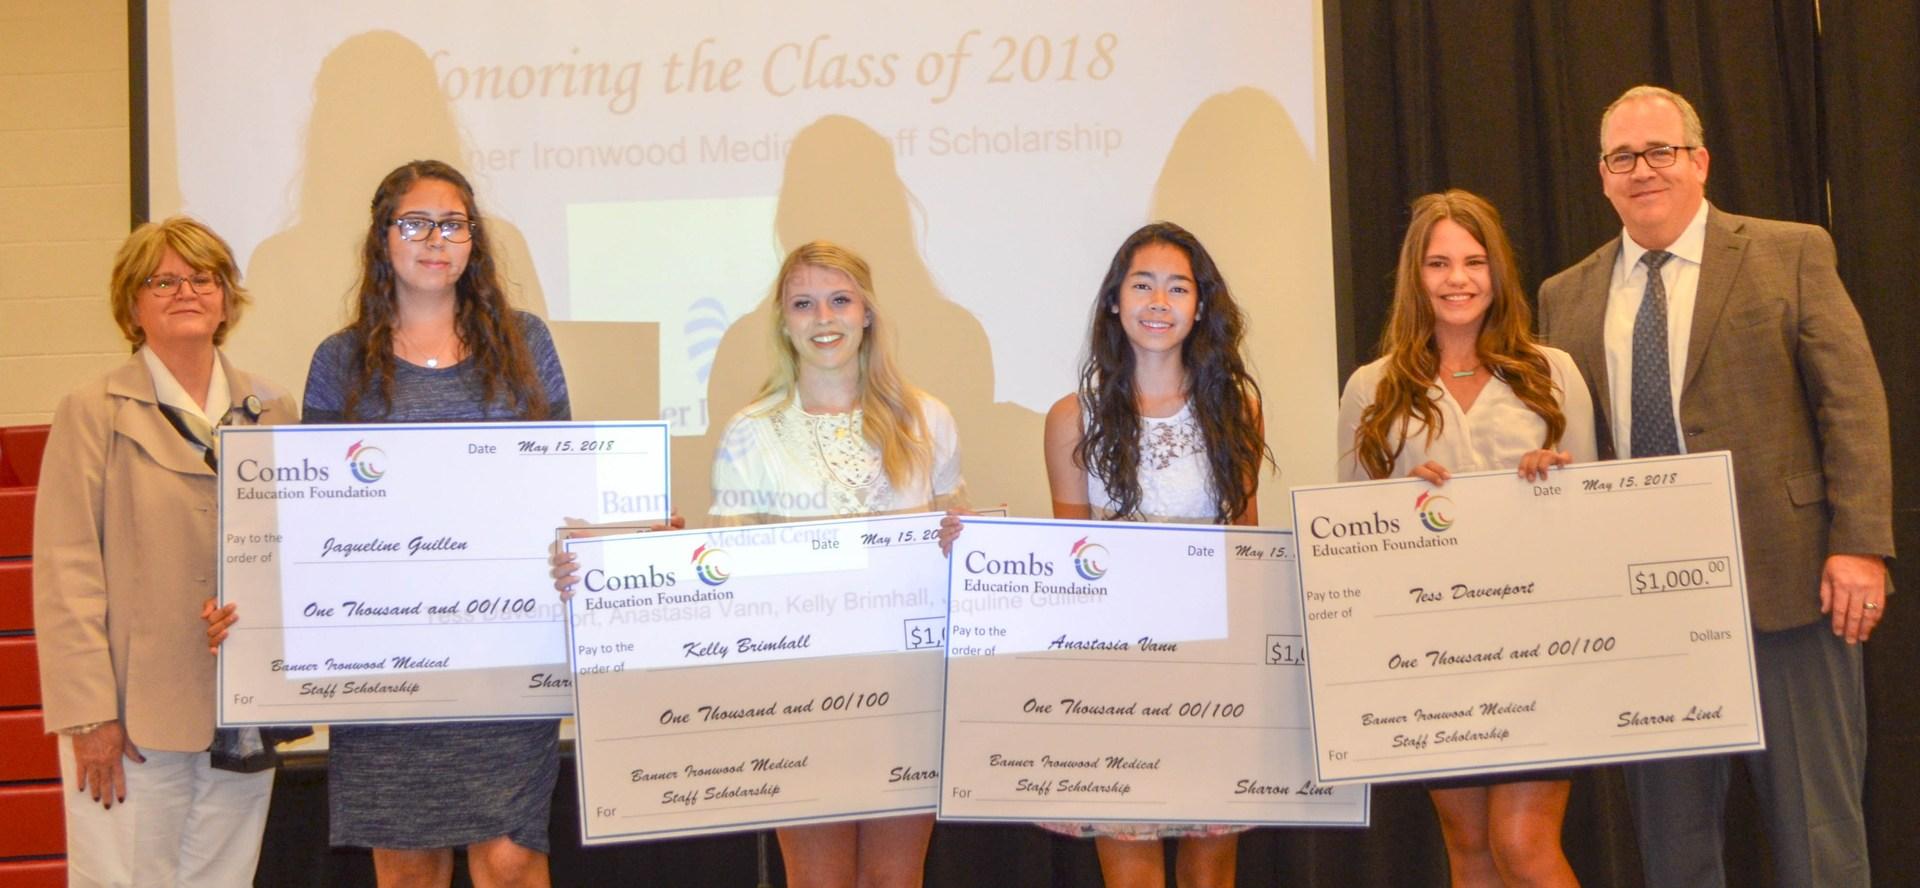 Banner Ironwood Medical Staff Scholarship Awardees